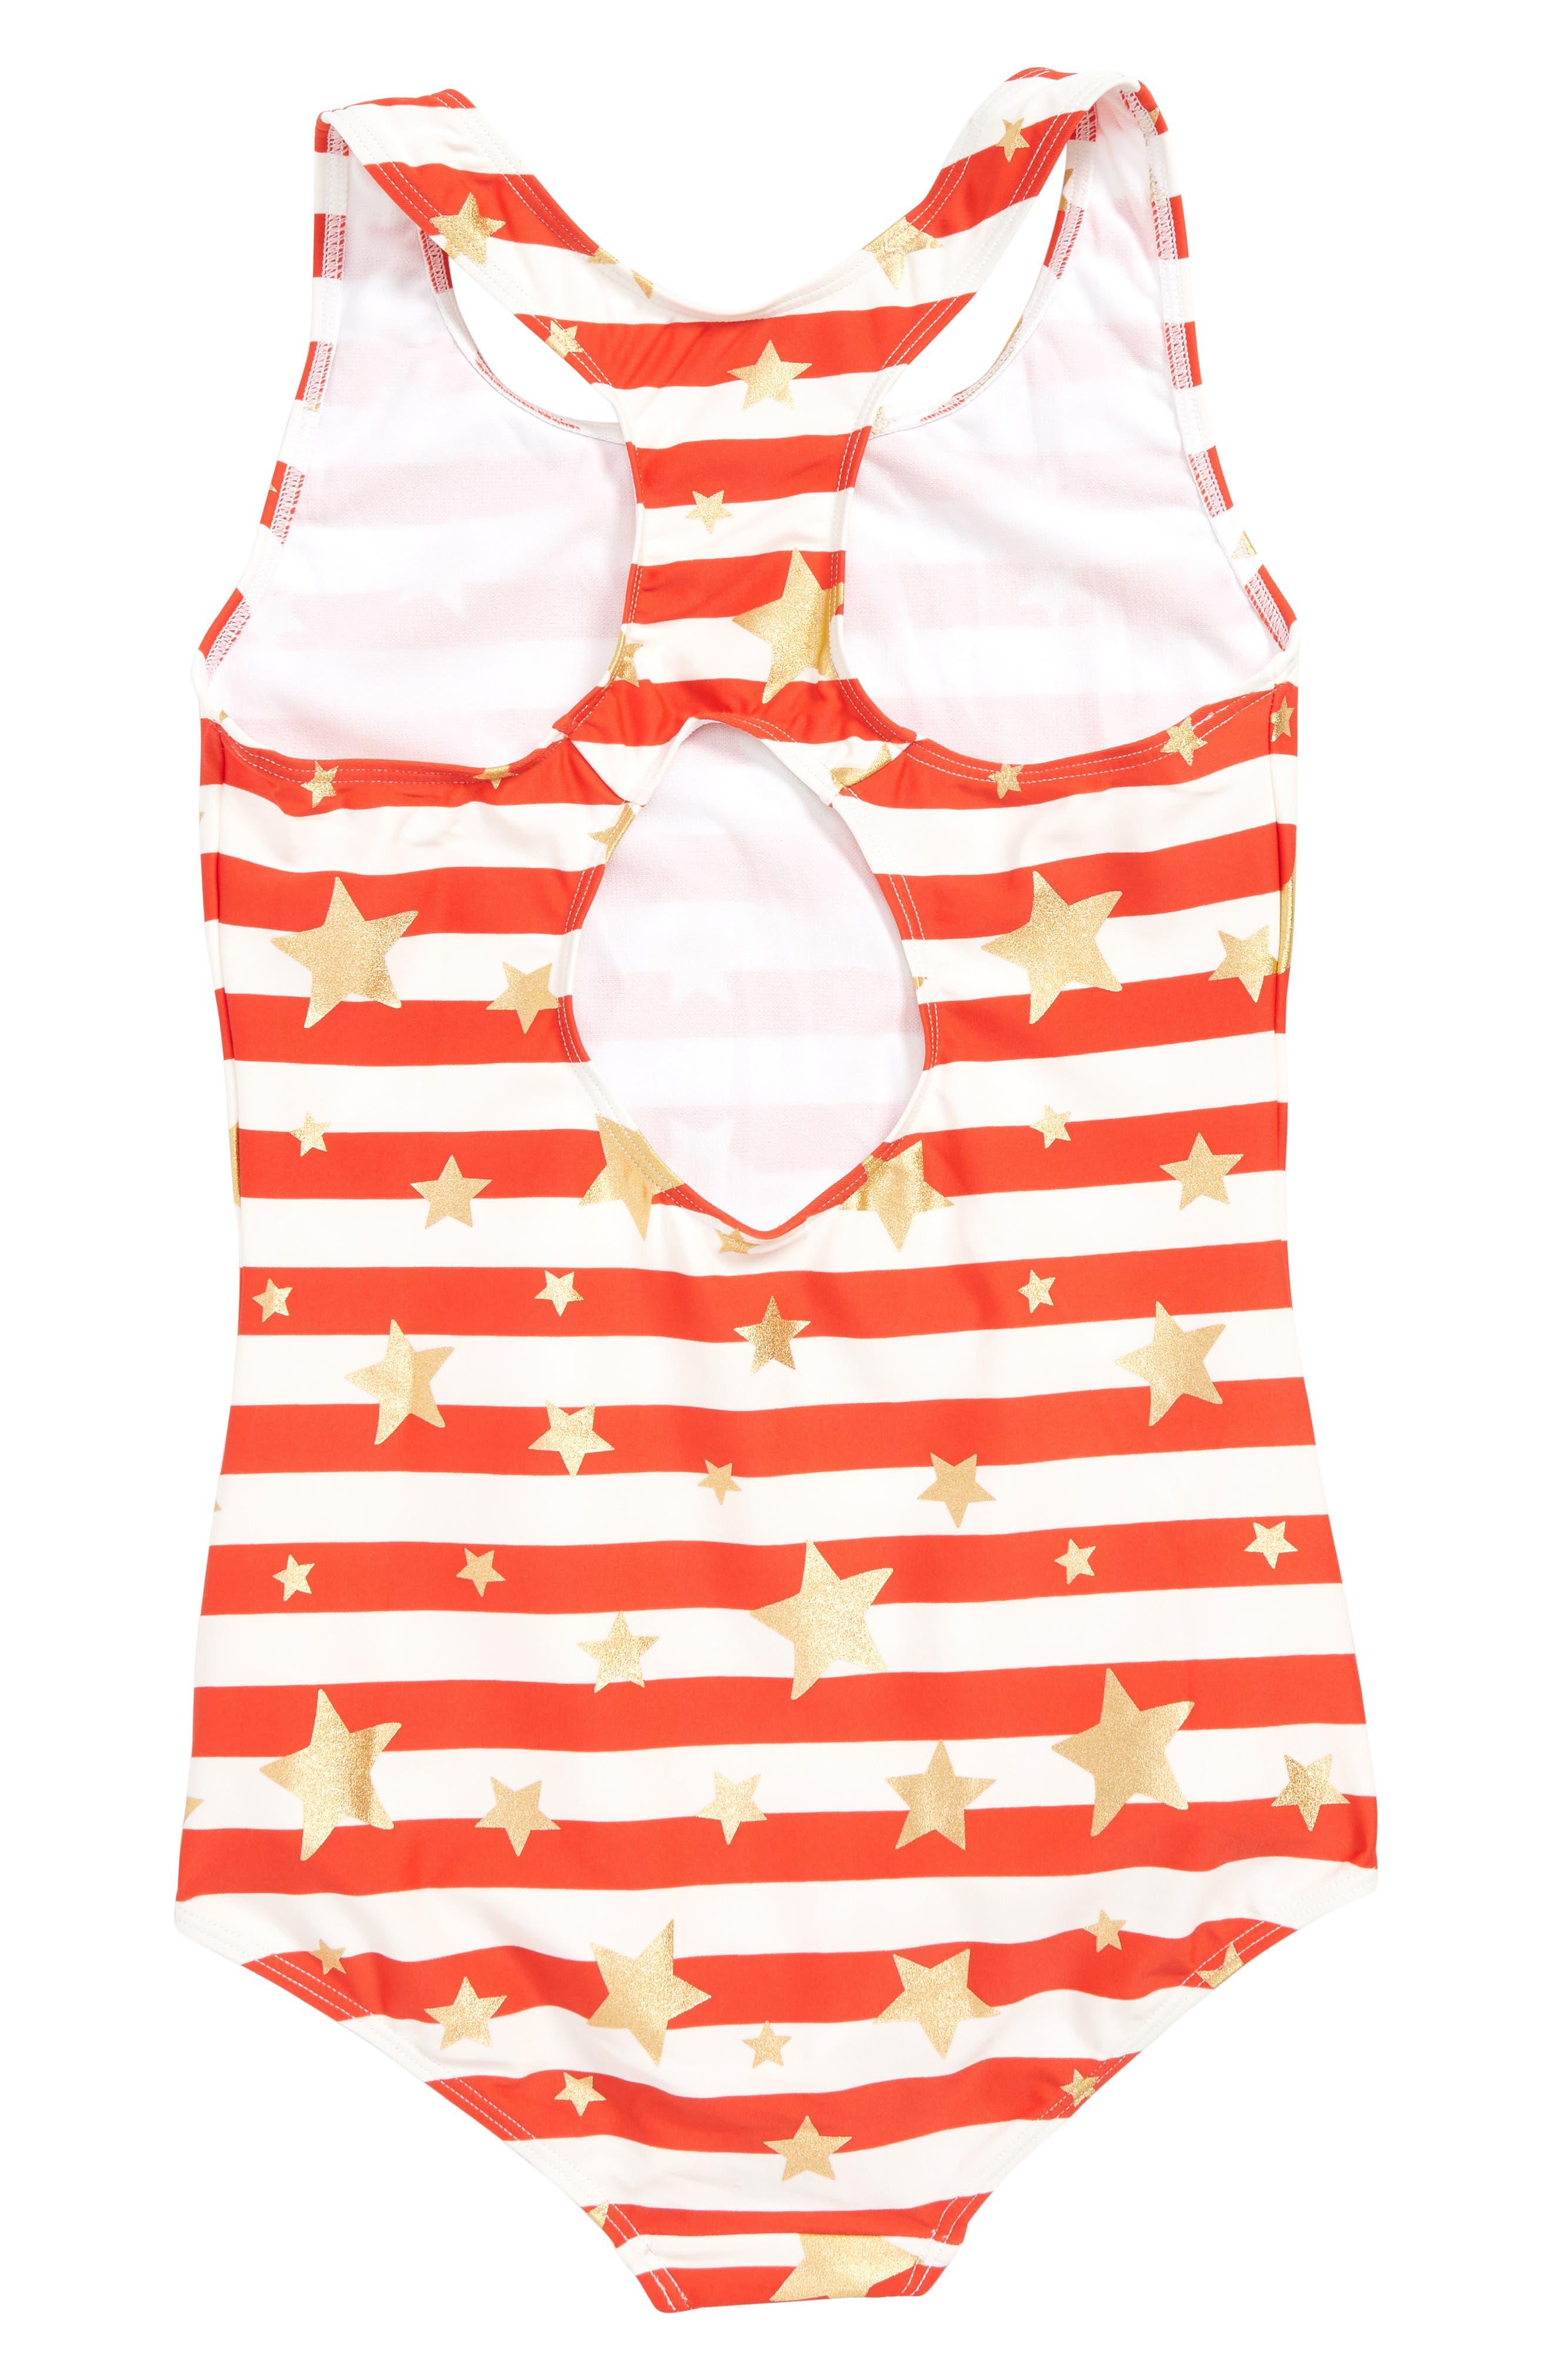 MINI BODEN,                             Print One-Piece Swimsuit,                             Alternate thumbnail 2, color,                             RED SUNSET GOLD HEART BRETON